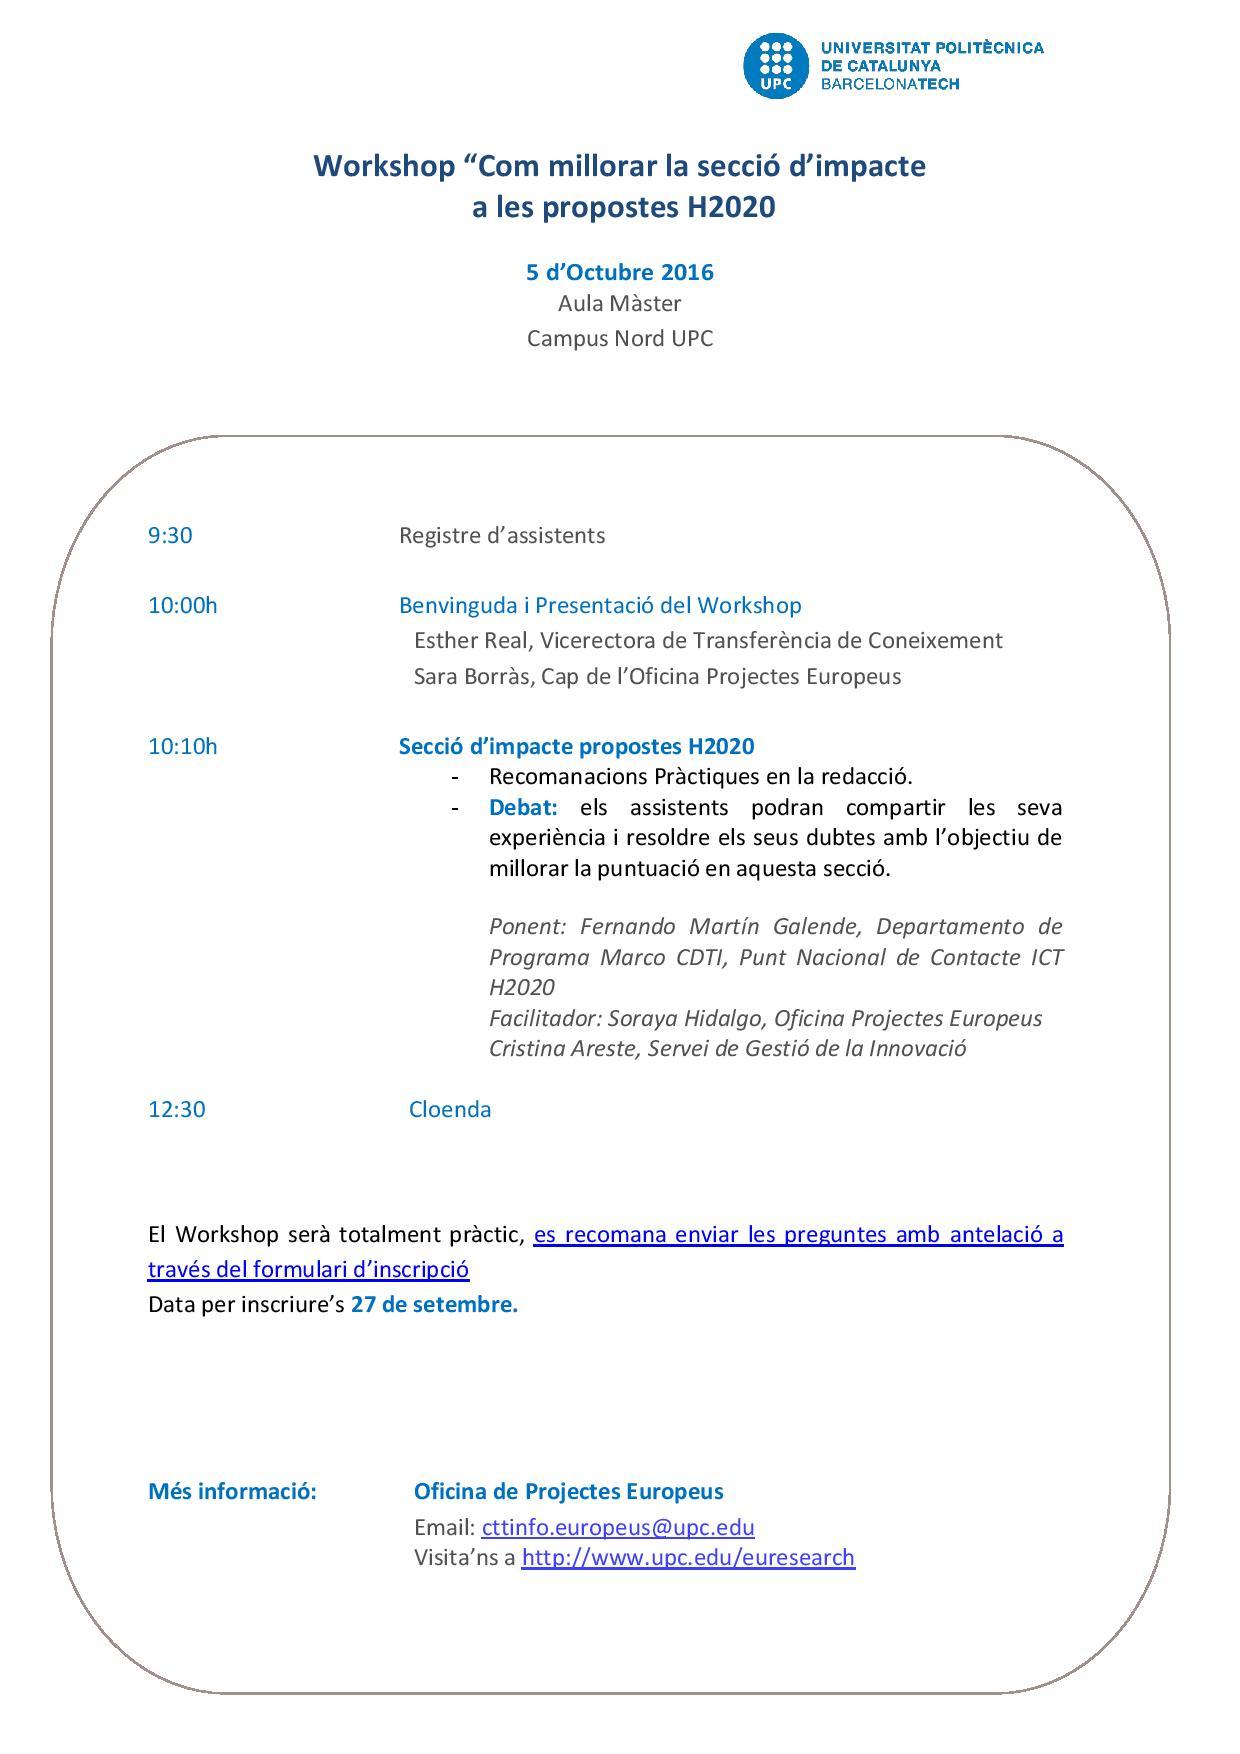 Impact workshop